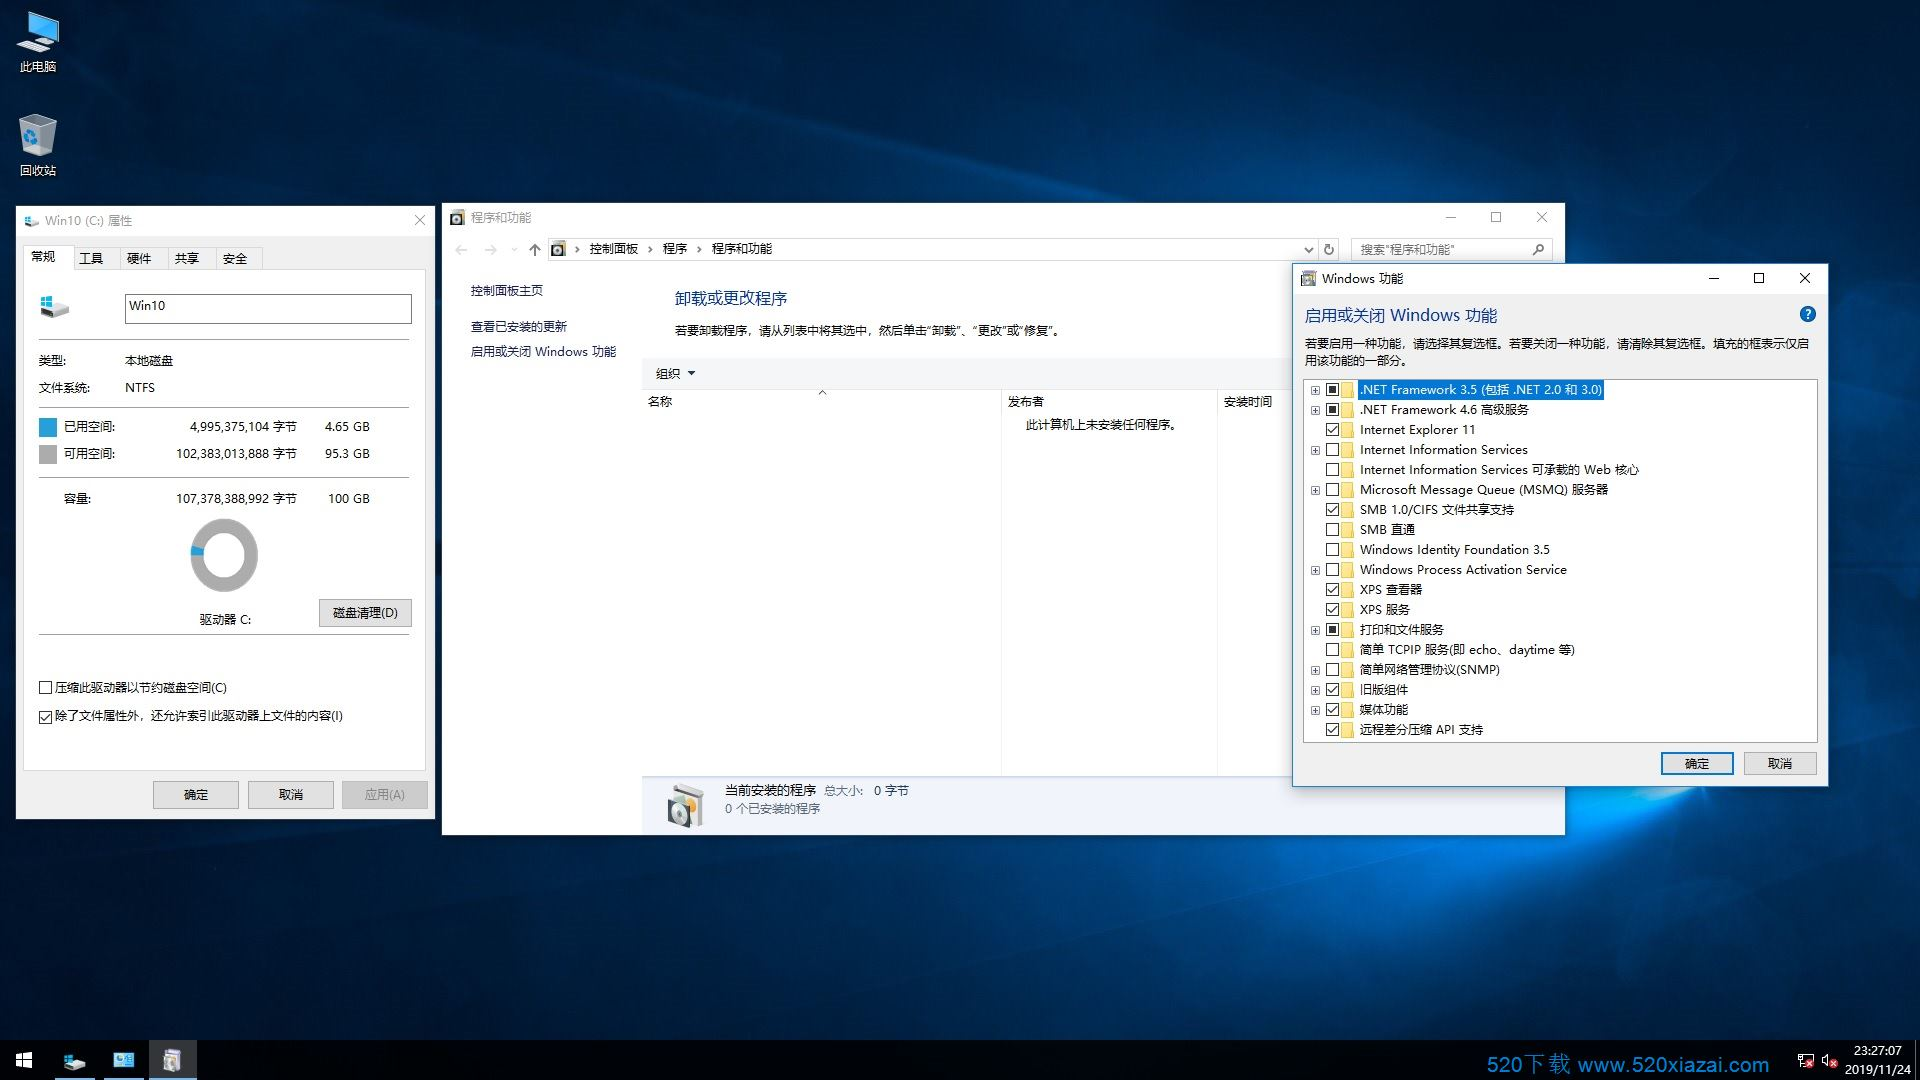 Win10LTSB2016 windows10精简版